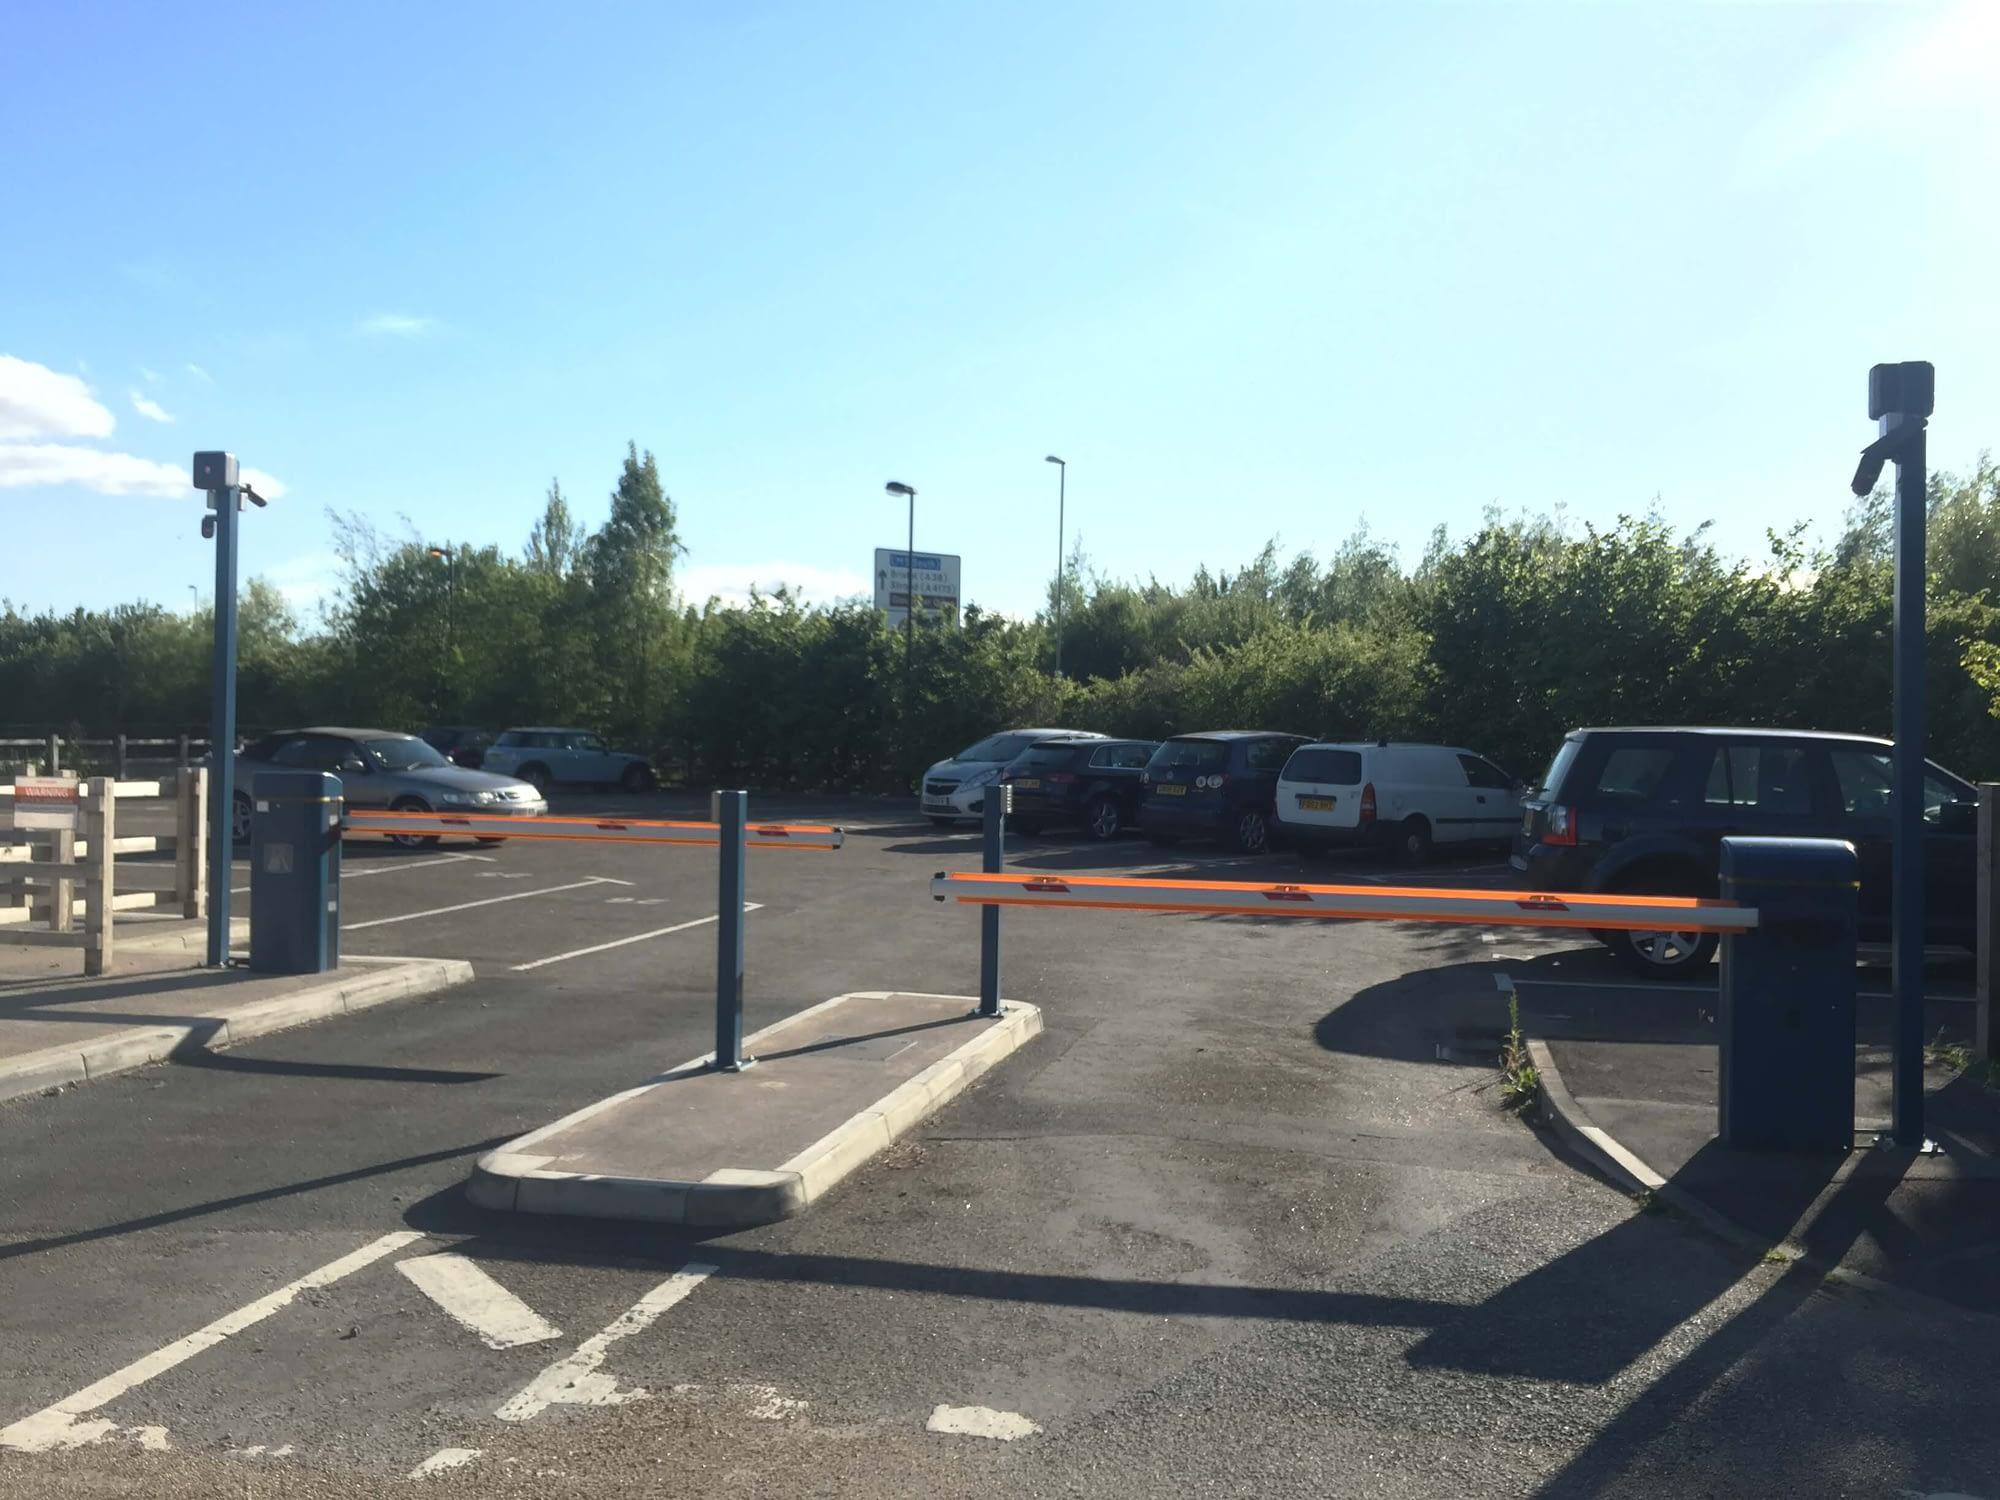 DOUBLE BARRIERS AND CCTV FOR THE CASTLEMEADS CAR PARK GLOUCESTER